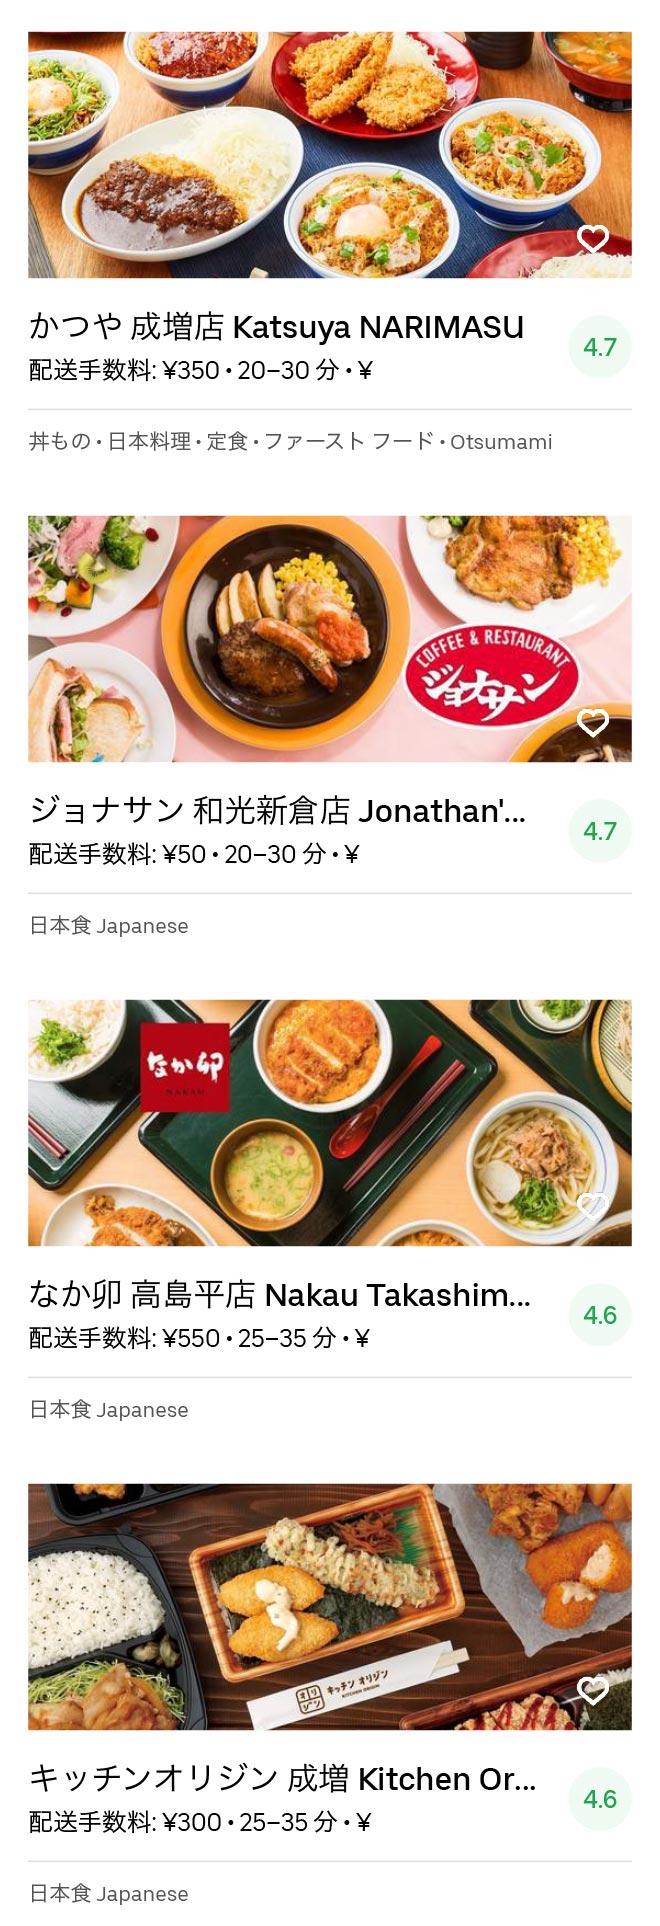 Saitama wako menu 2004 05